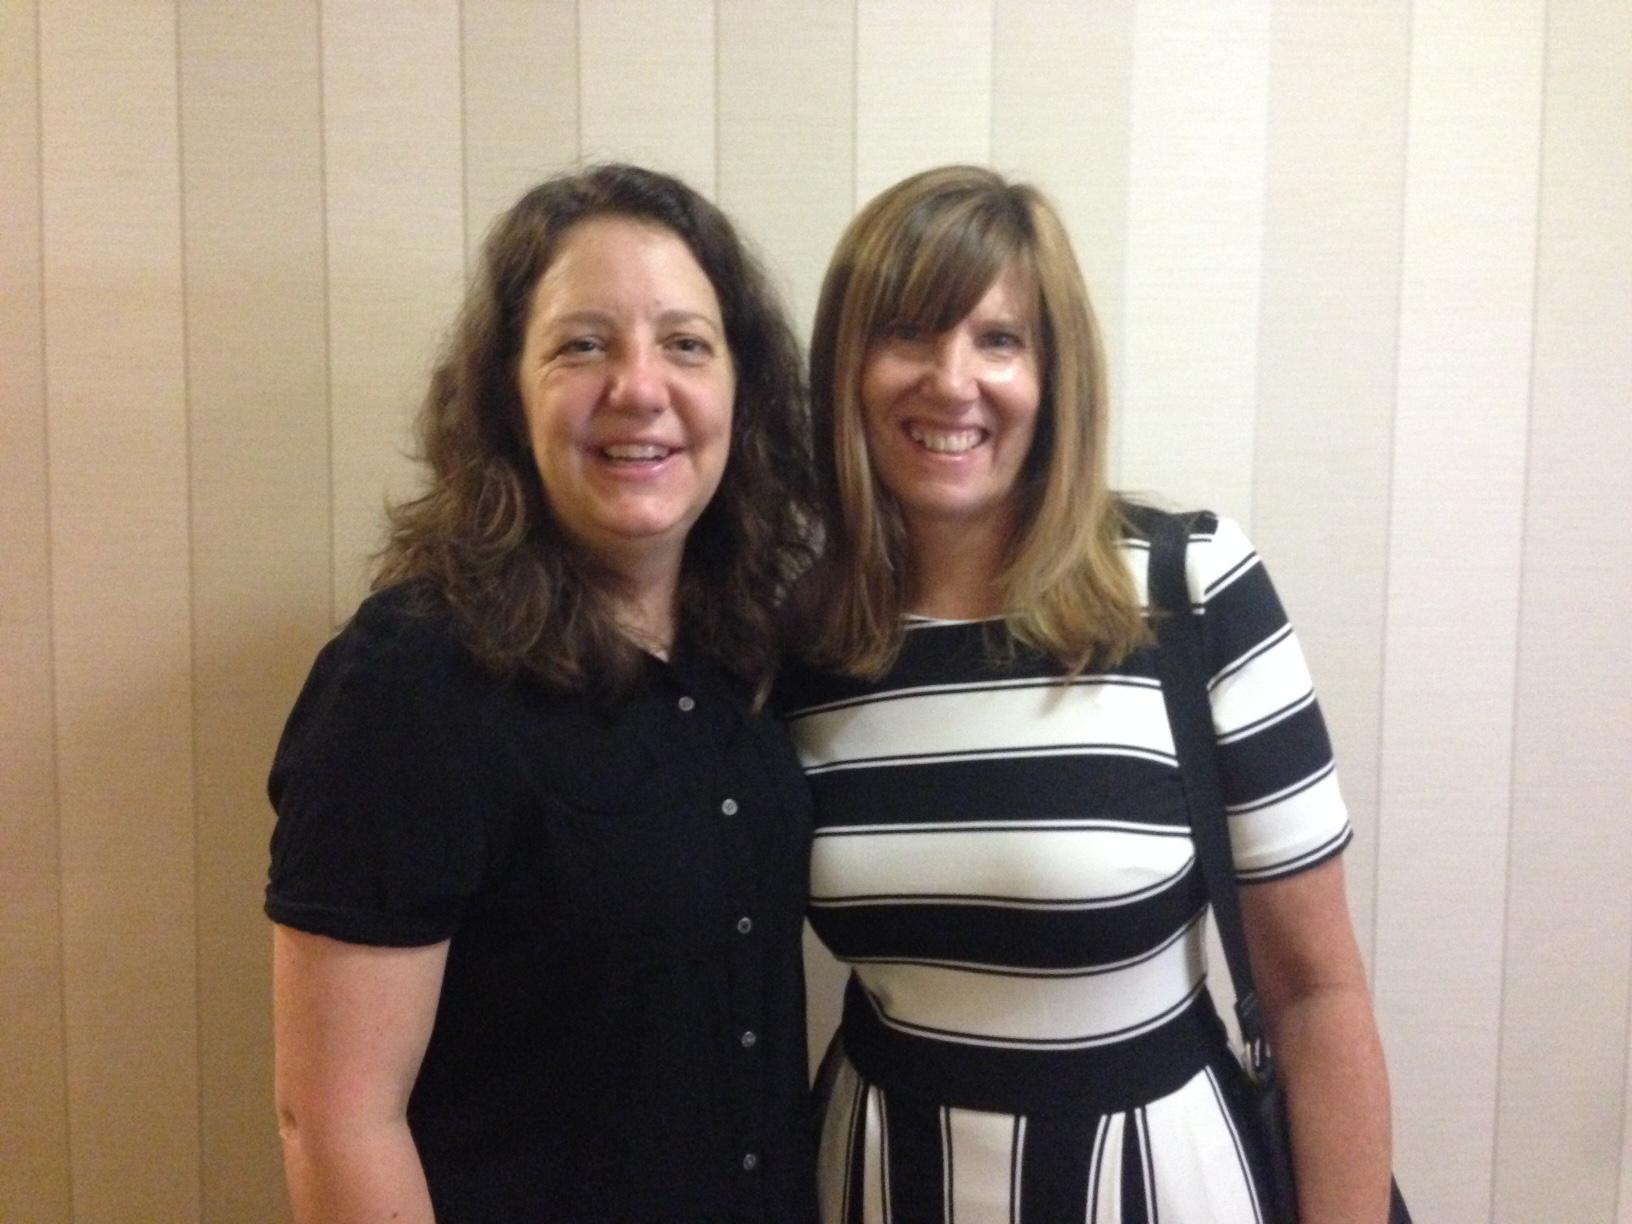 Metropolitan State University colleagues Meg Frisbee and Patricia Richard.